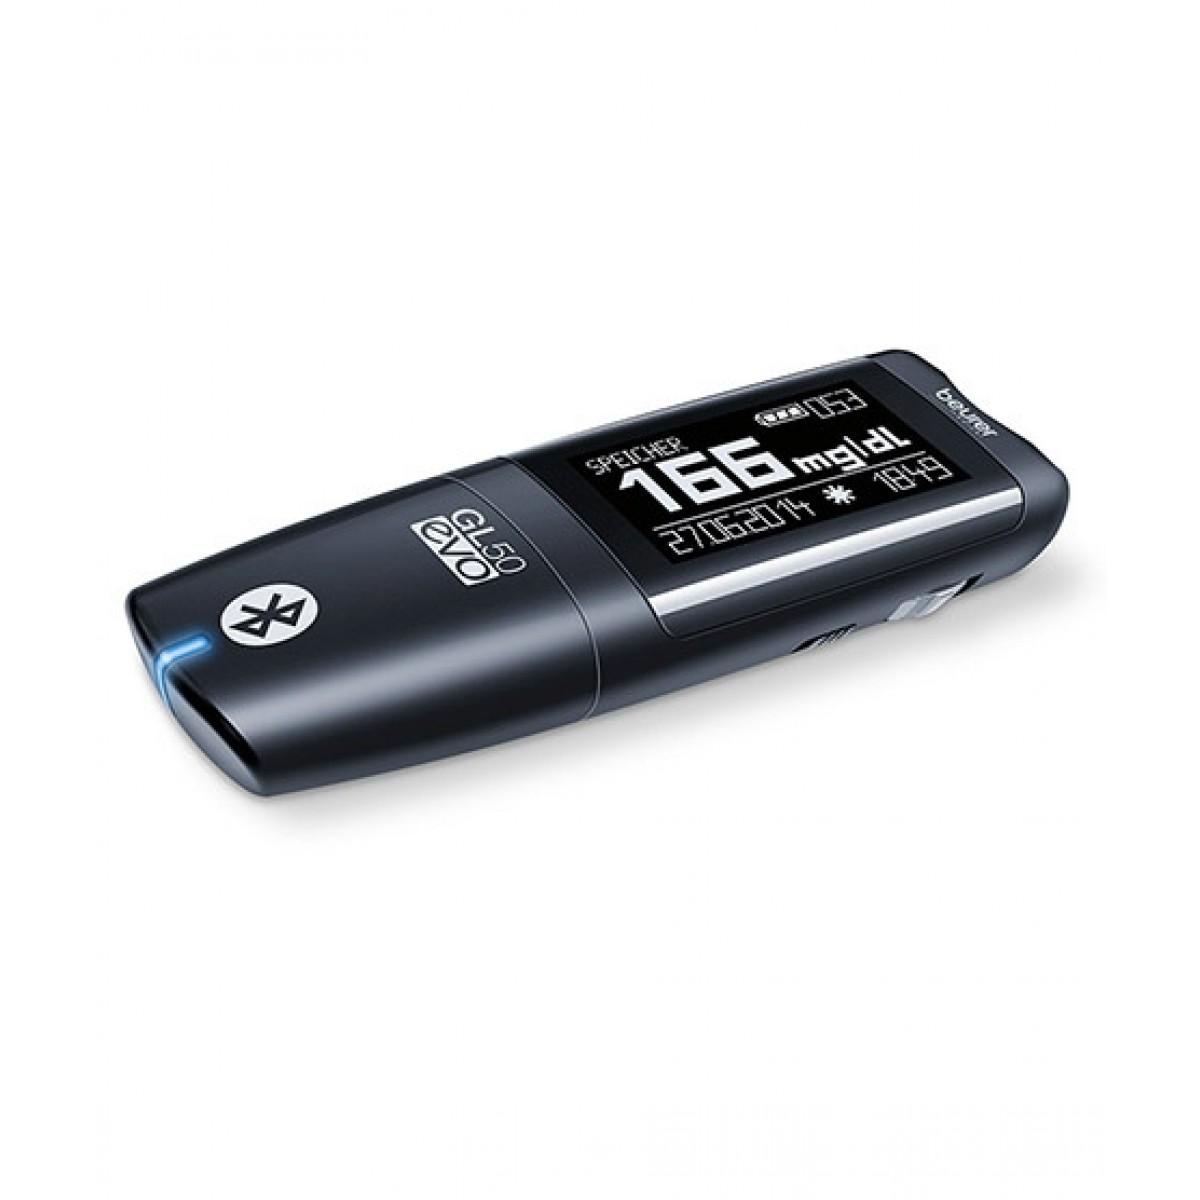 Beurer Bluetooth Adapter For GL-50 Evo (GL-50 Bluetooth)